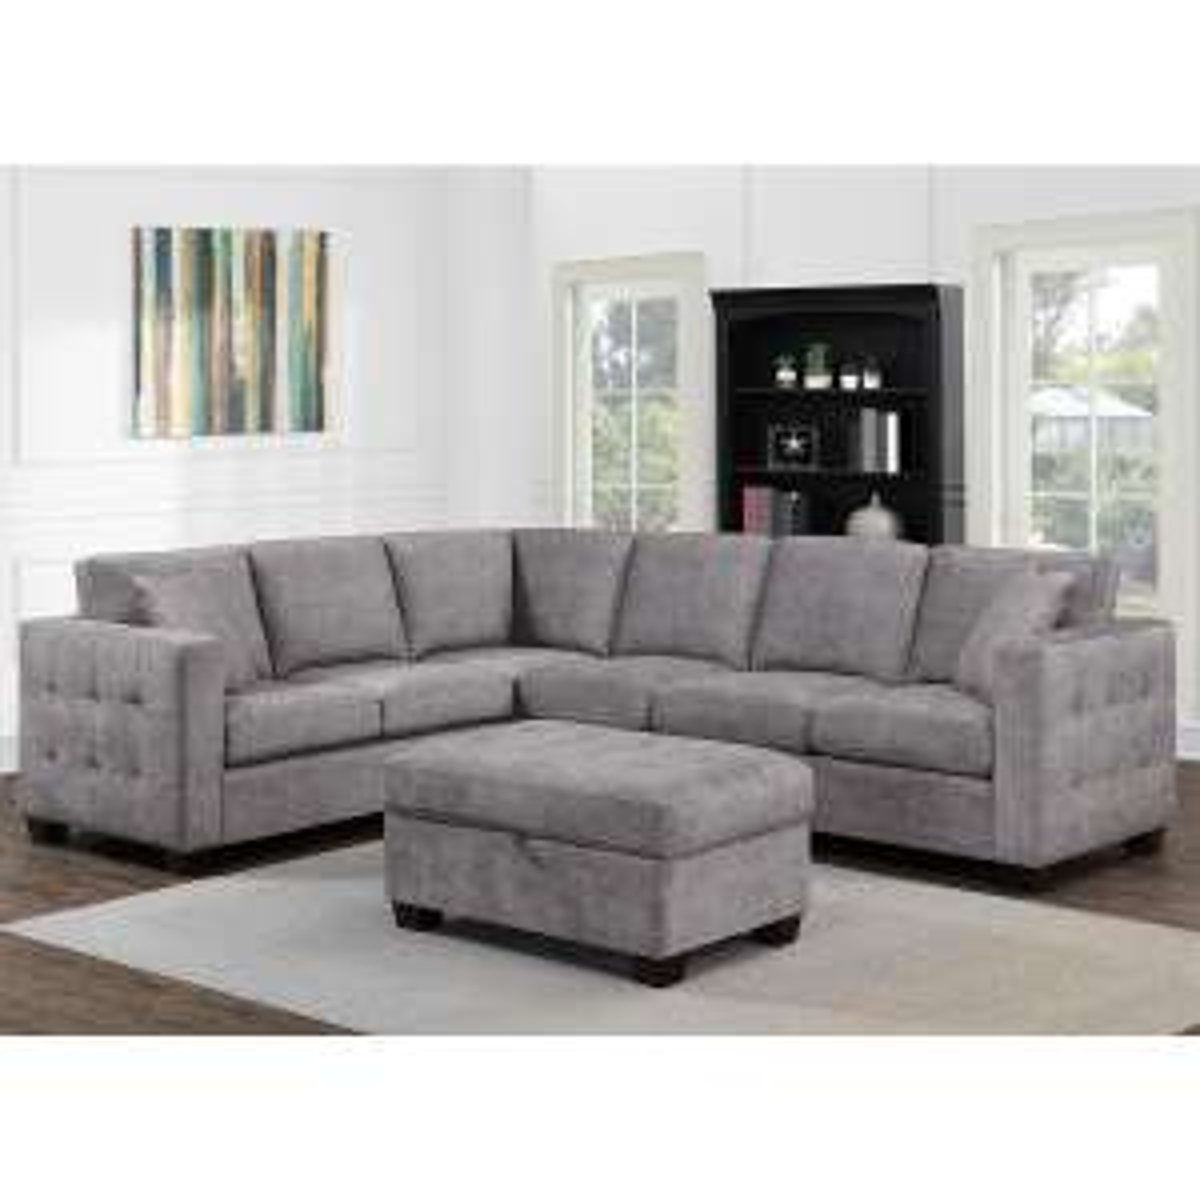 Thomasville Kylie Grey Fabric Corner Sofa with Storage Ottoman £1299.99 @ Costco